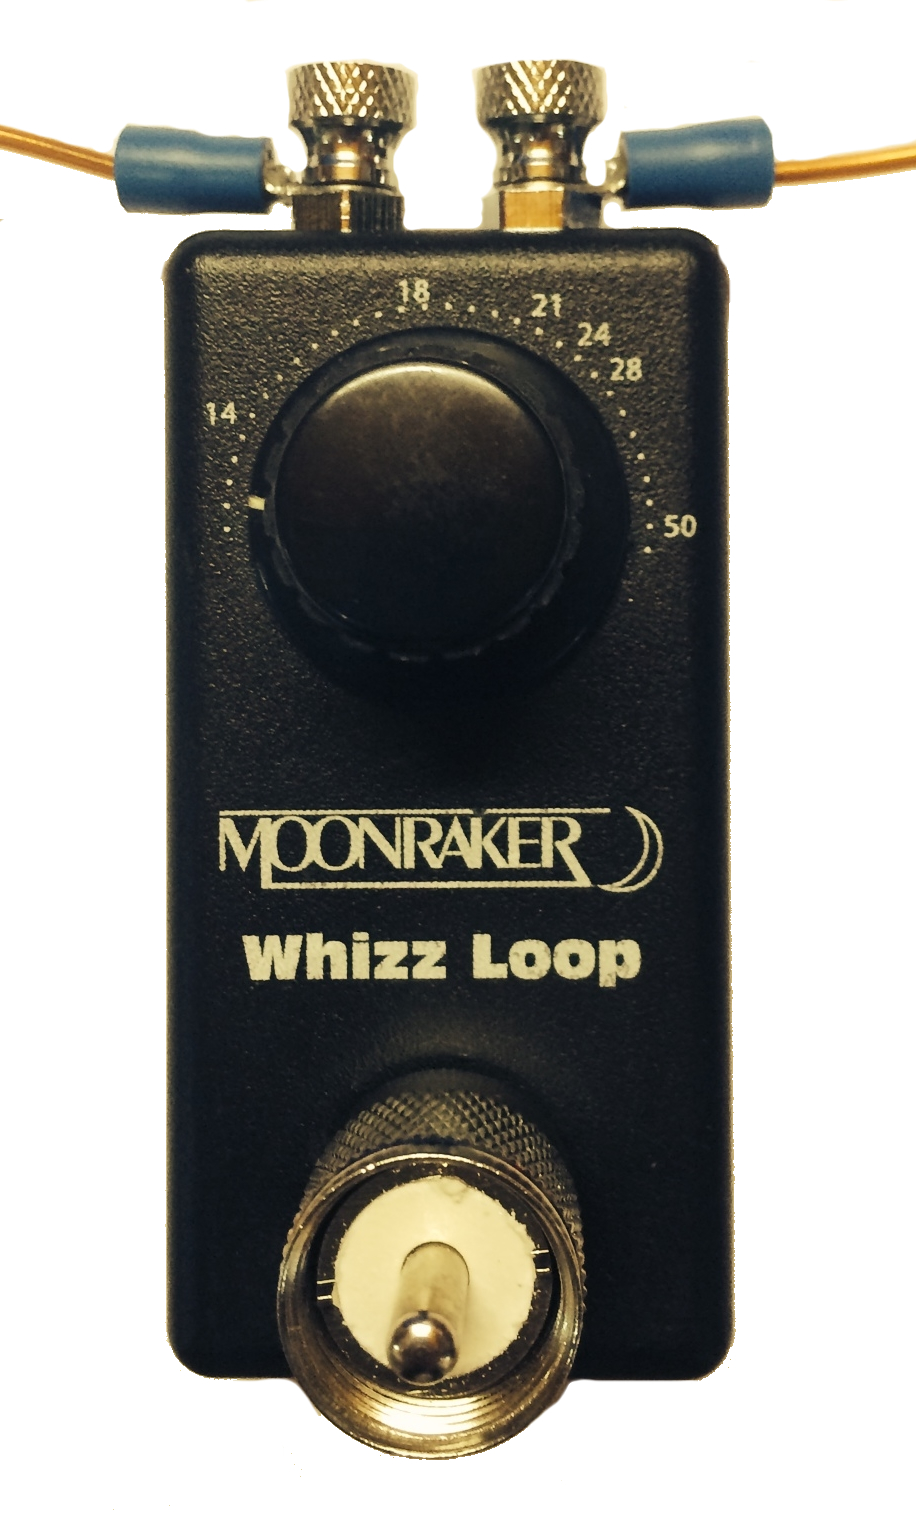 moonraker whizz loop v2 atu funktechnik bielefeld professionelles equipment f r gehobene anspr che. Black Bedroom Furniture Sets. Home Design Ideas